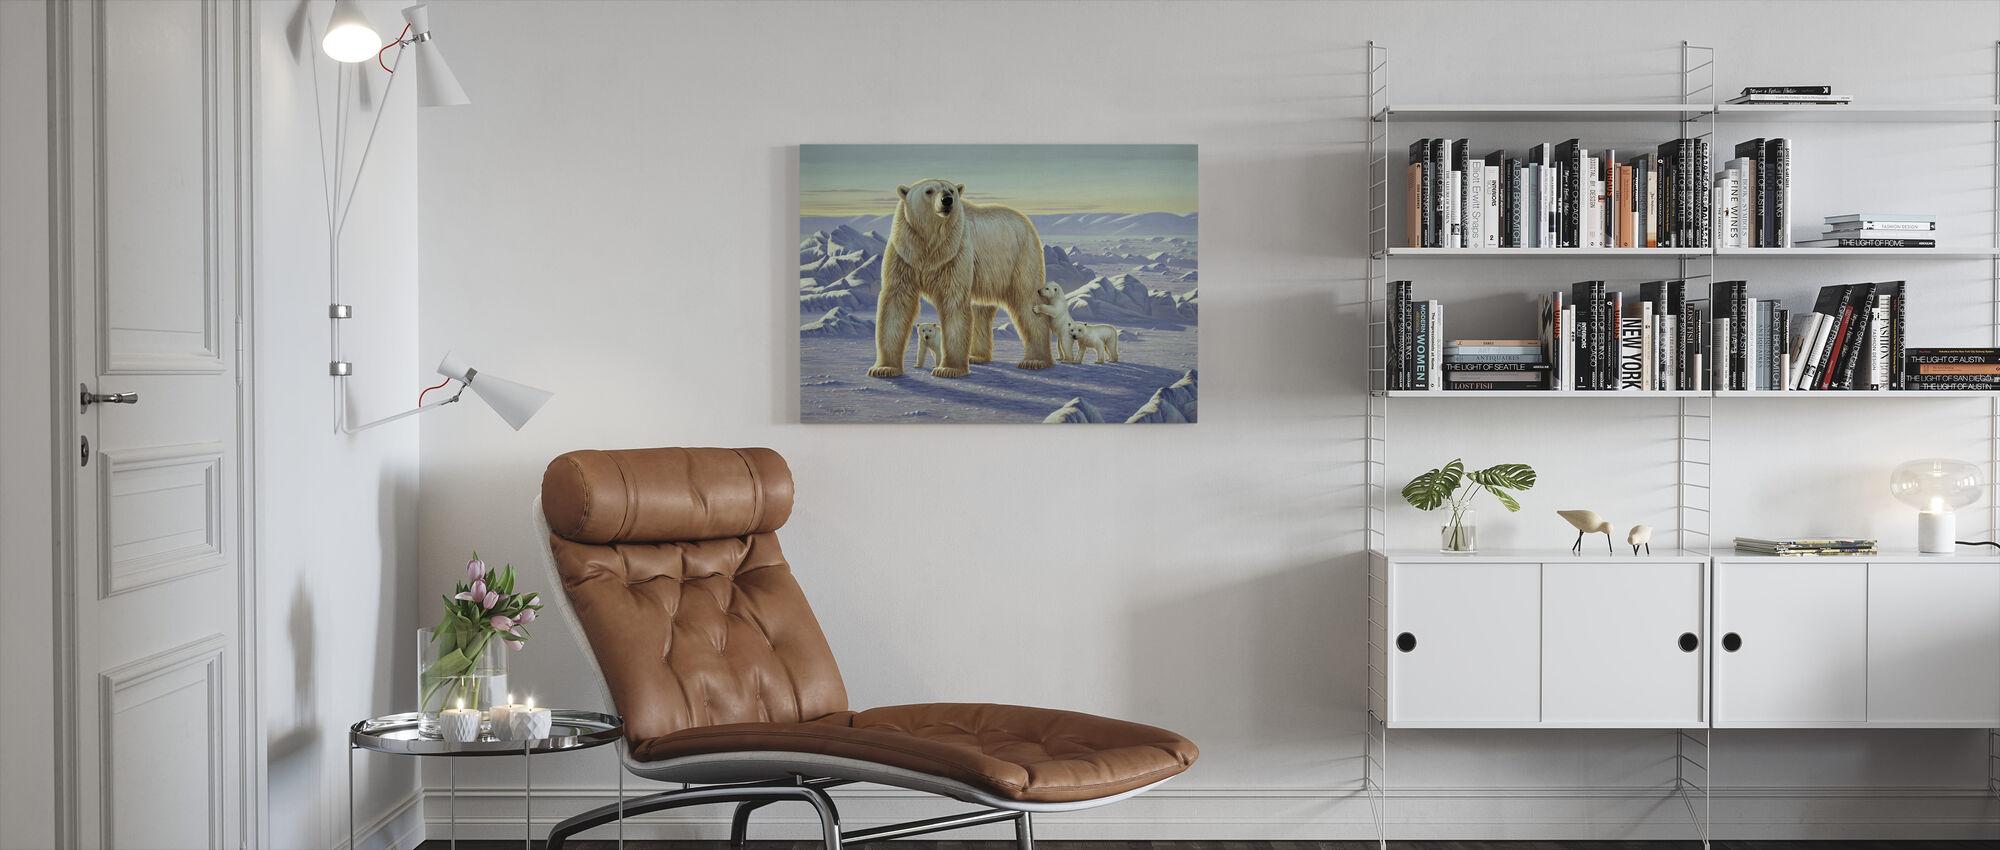 Isbjörn med ungar - Canvastavla - Vardagsrum